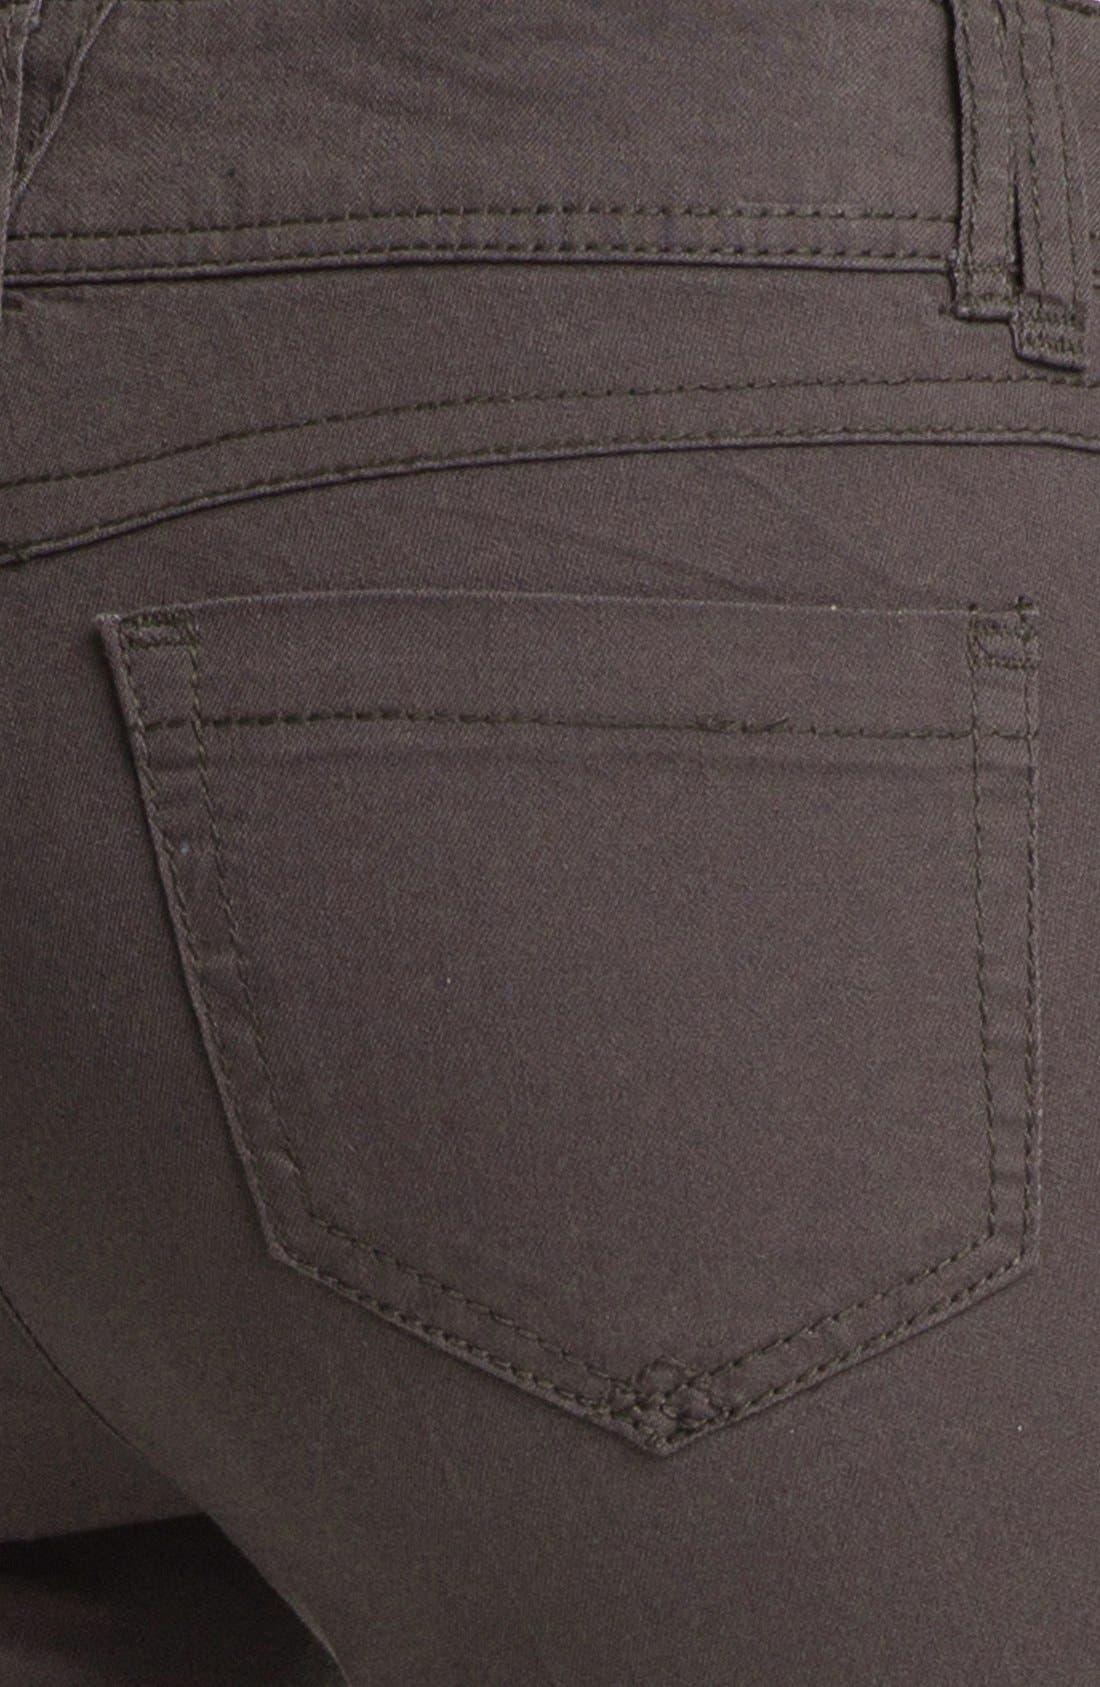 Colored Denim Skinny Jeans,                             Alternate thumbnail 2, color,                             020